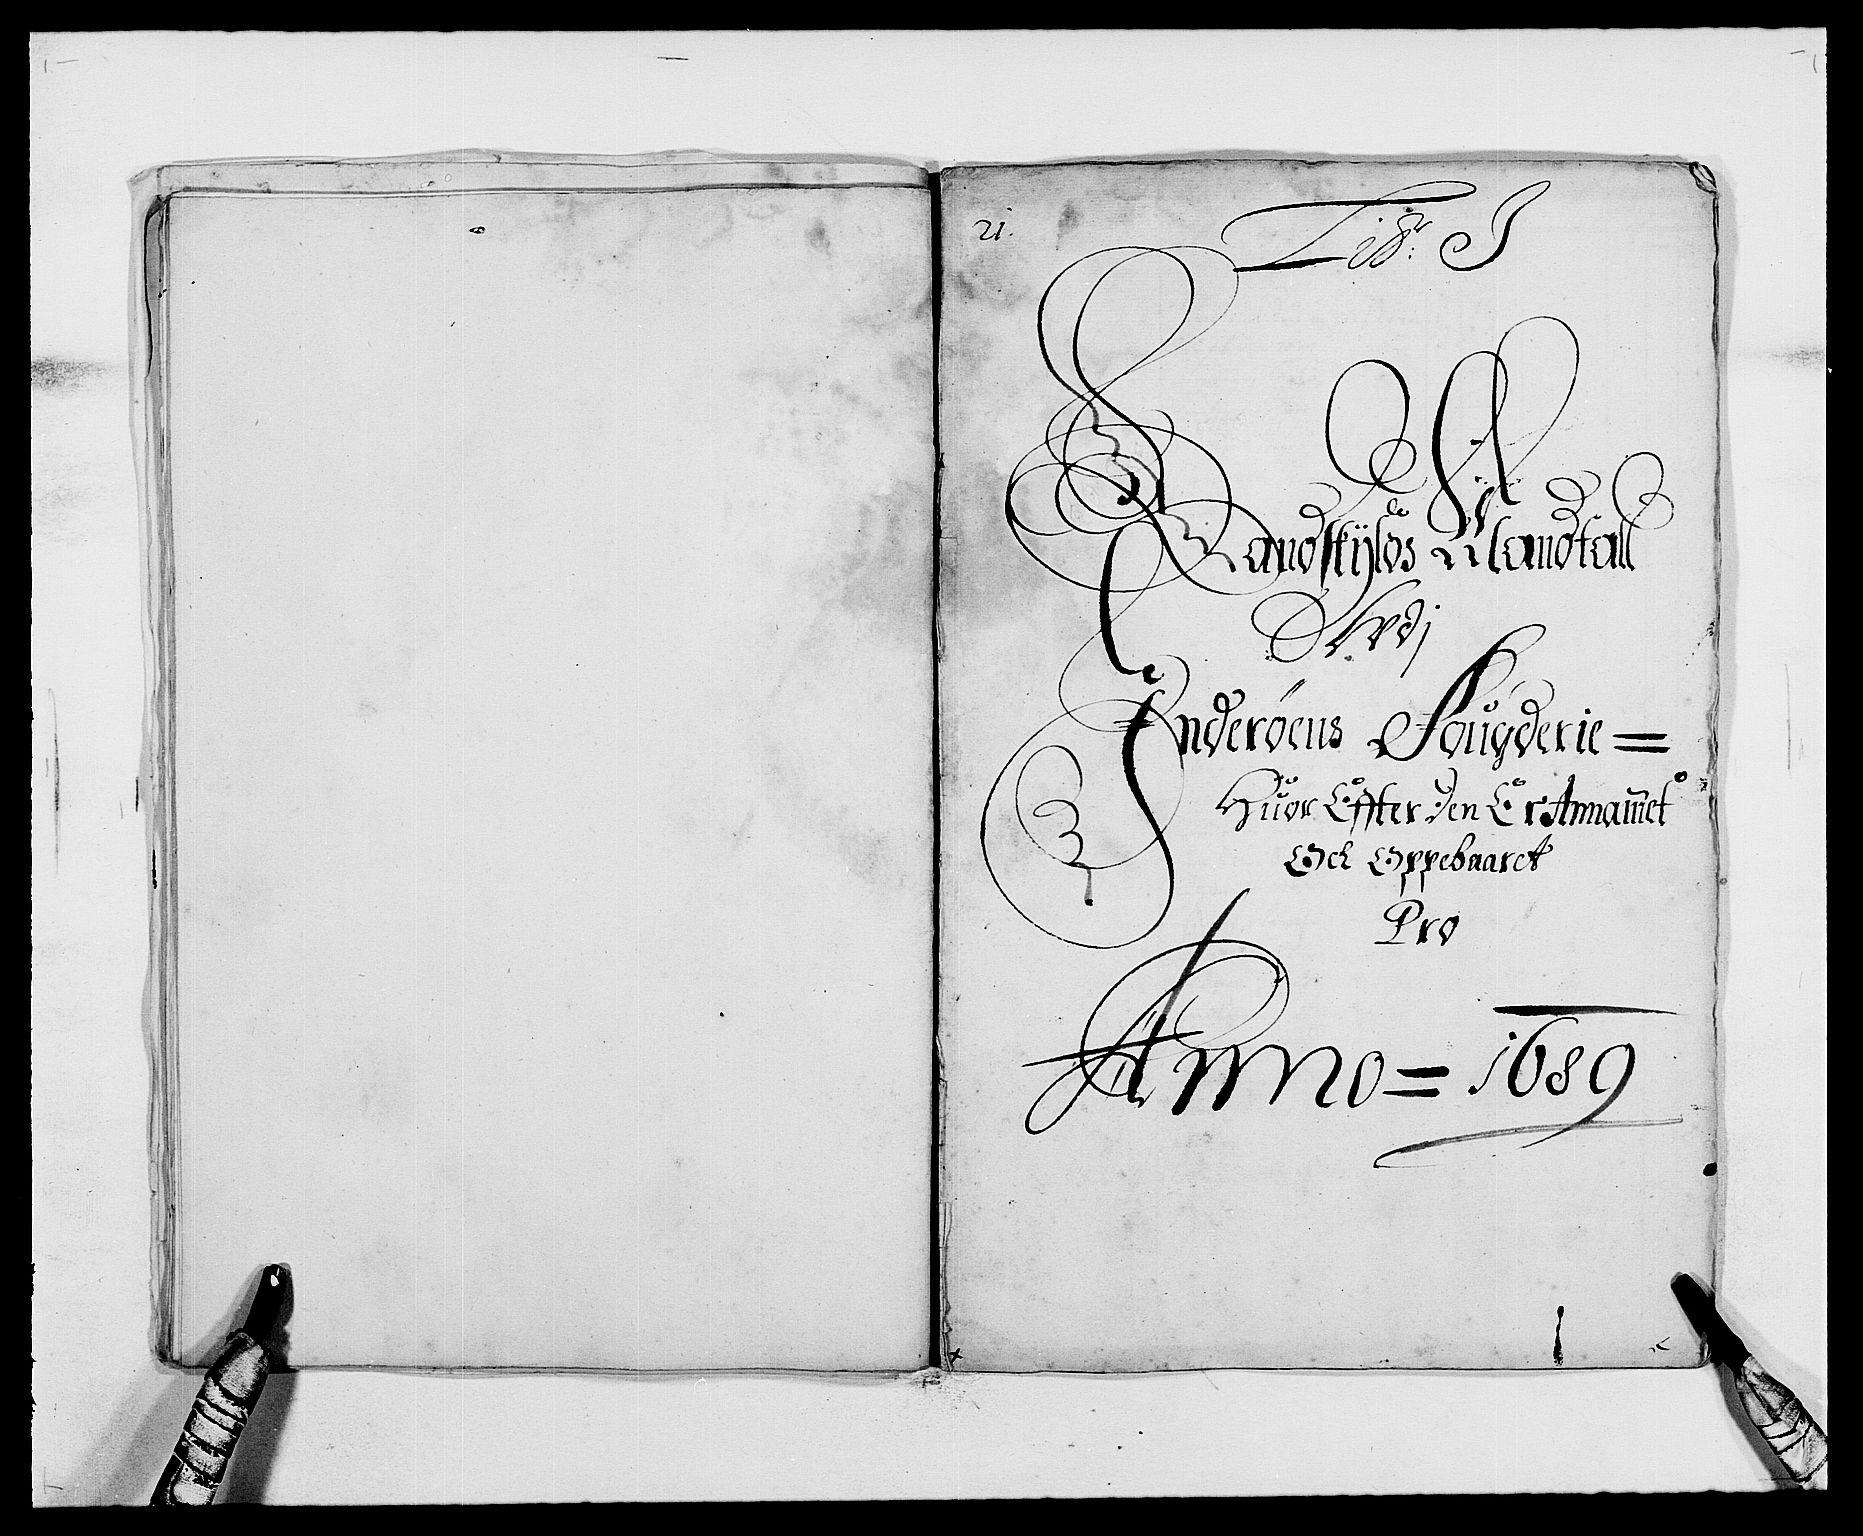 RA, Rentekammeret inntil 1814, Reviderte regnskaper, Fogderegnskap, R63/L4306: Fogderegnskap Inderøy, 1687-1689, s. 448